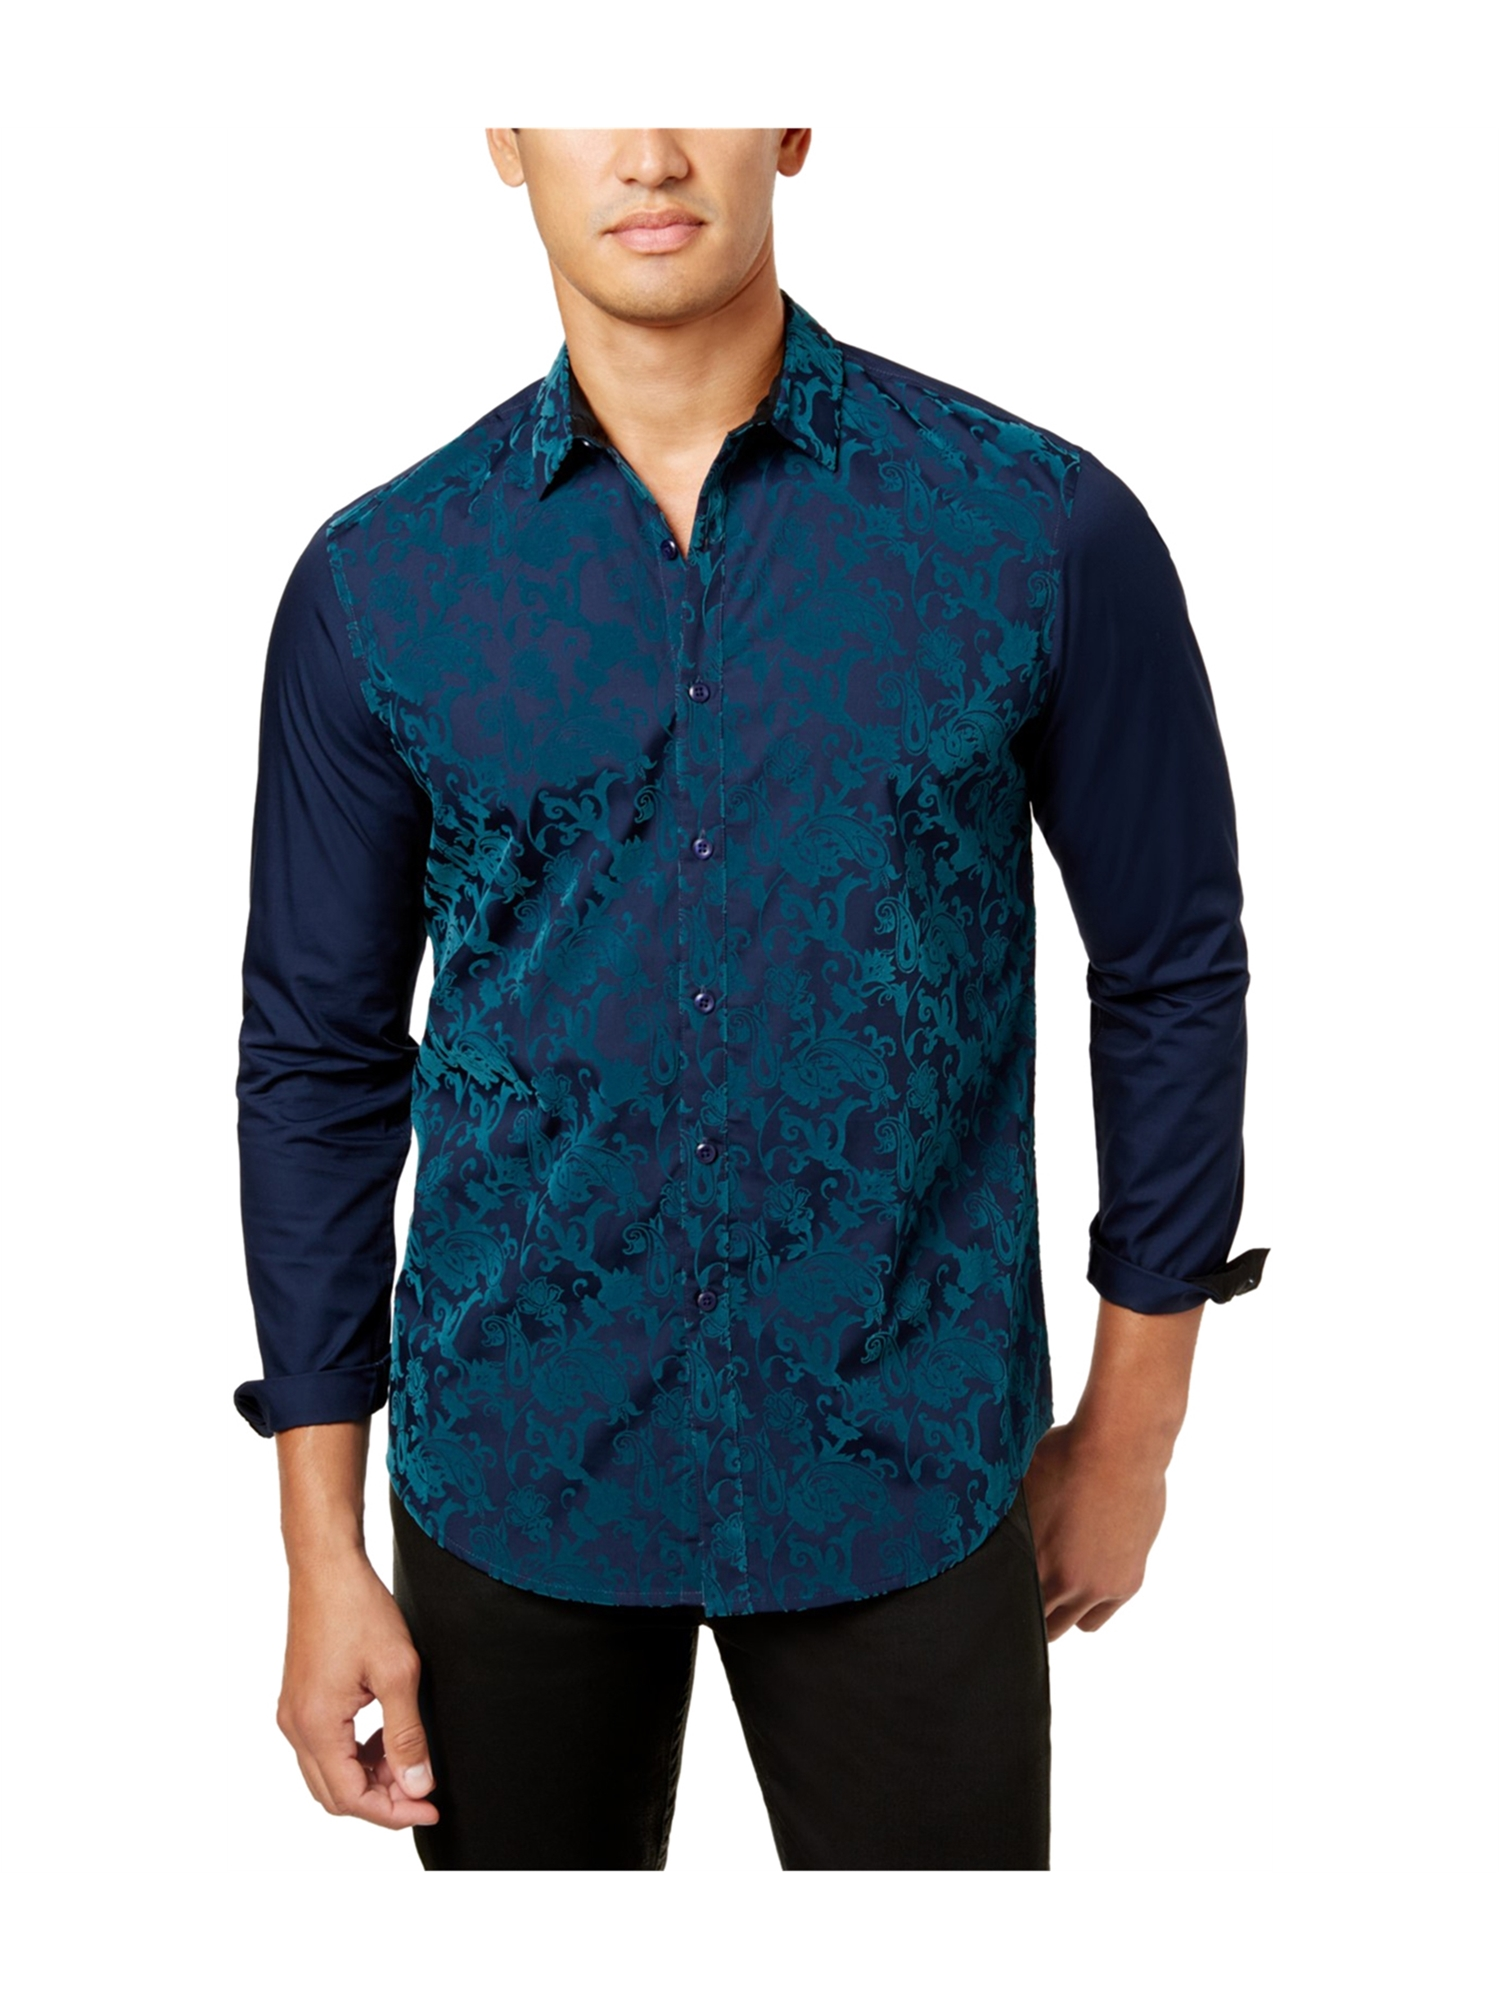 I-N-C Mens Flocked Paisley Button Up Shirt navycombo 2XL